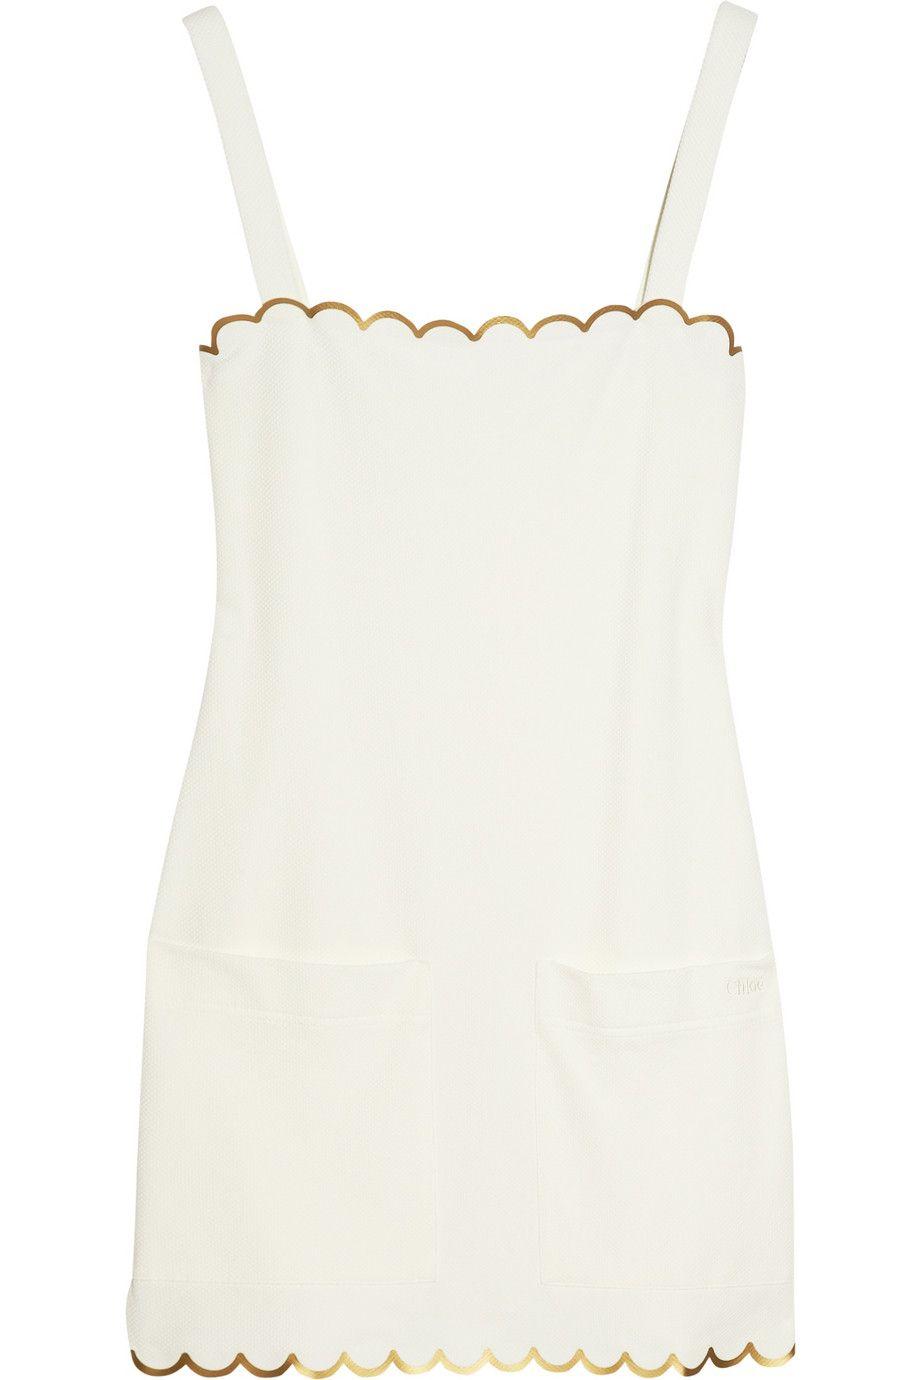 White Stretch Pique Mini Dress Chloe Fashion Fashion Obsession Fashionista [ 1380 x 920 Pixel ]